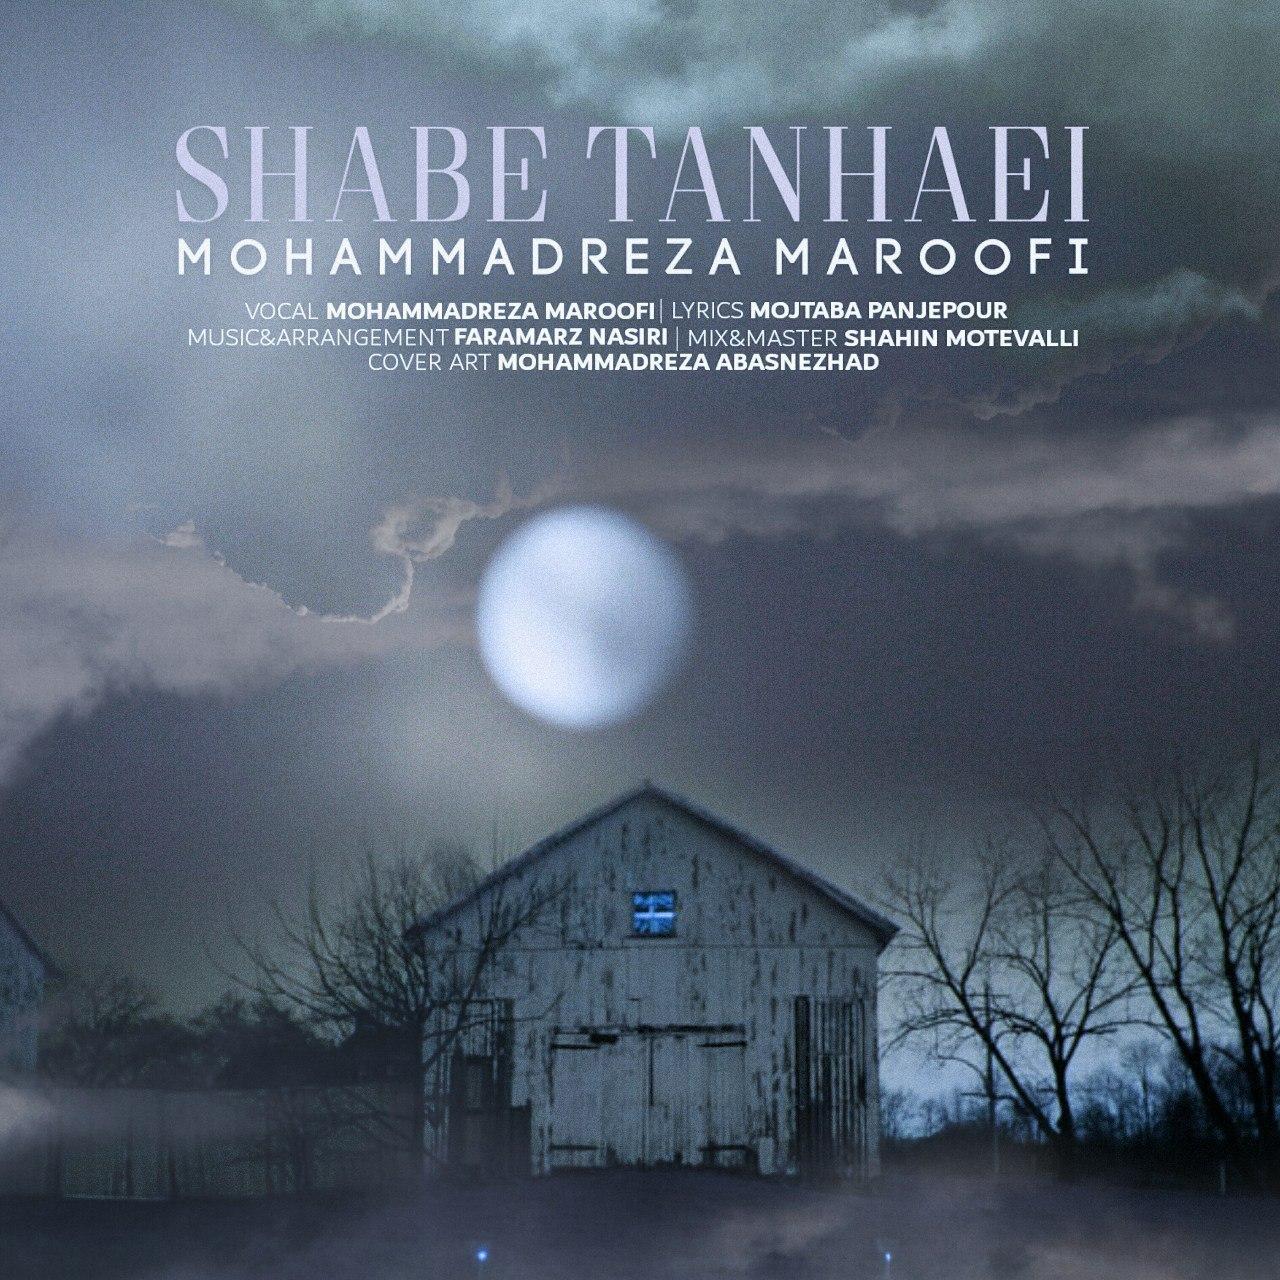 Mohammadreza Maroofi – Shabe Tanhaei